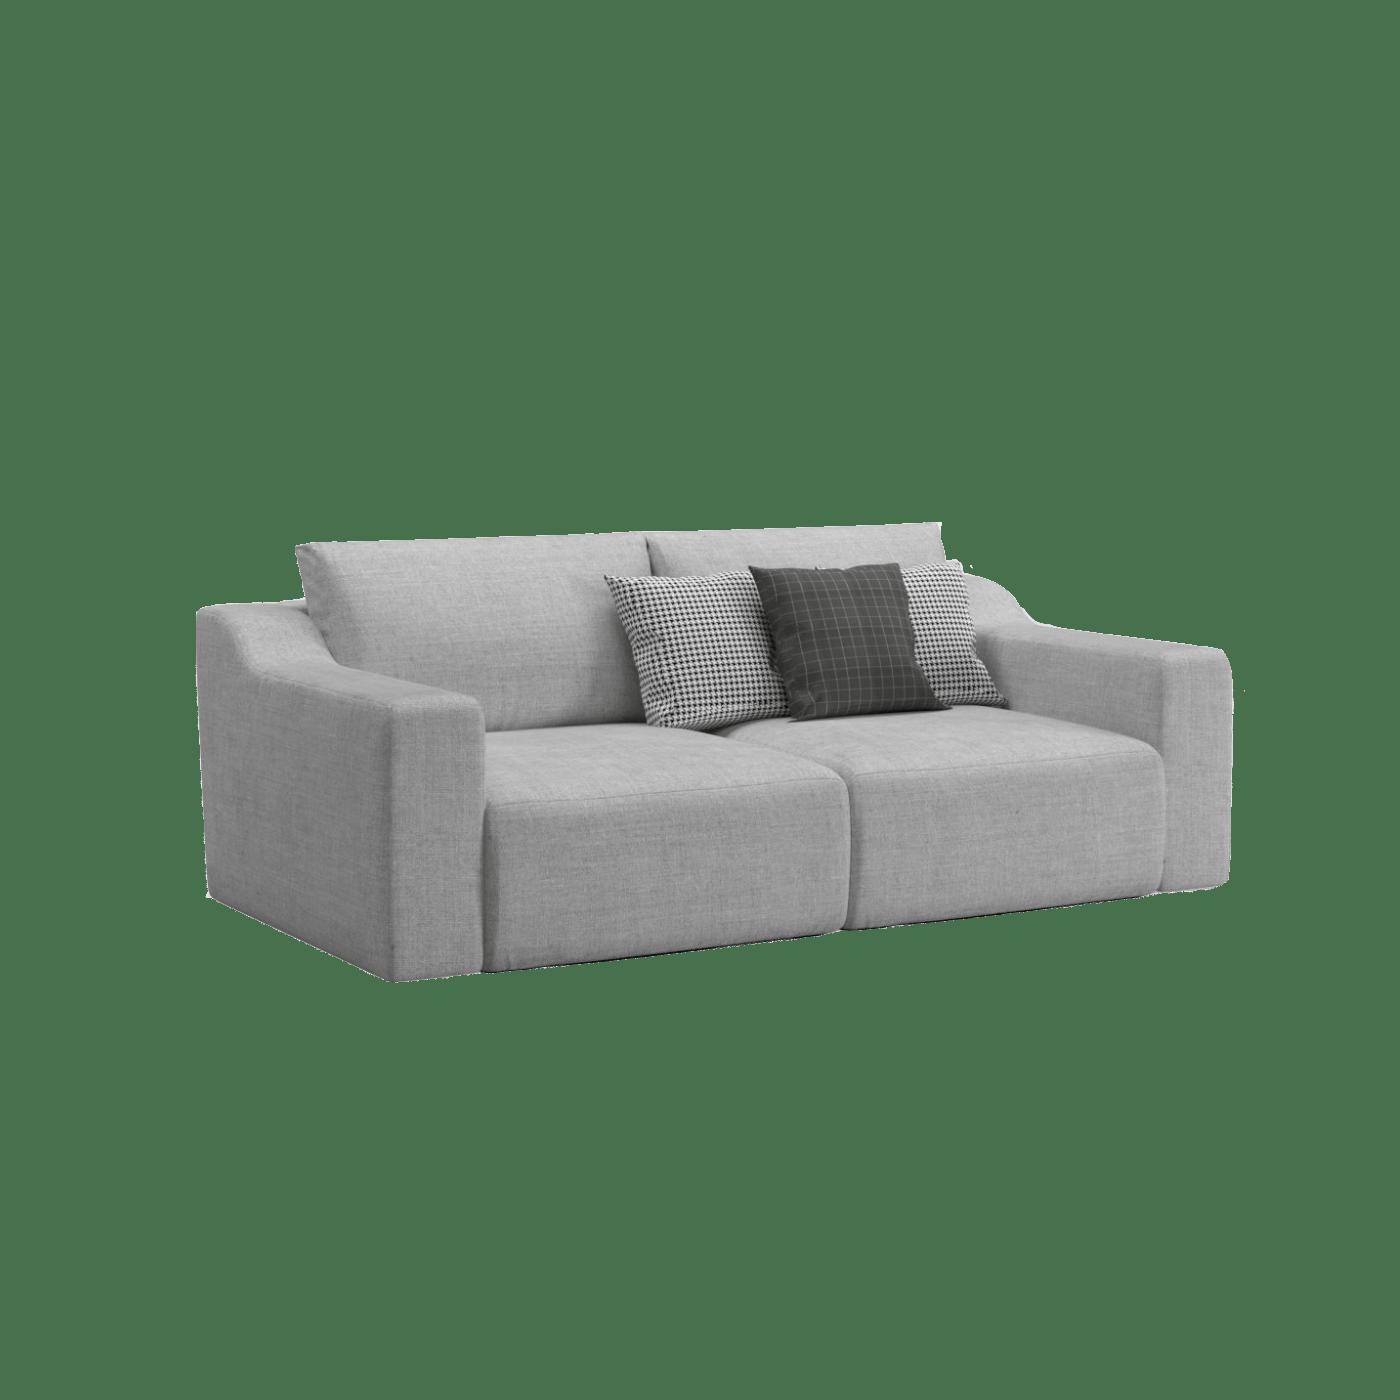 Ellender 2 seater sofa